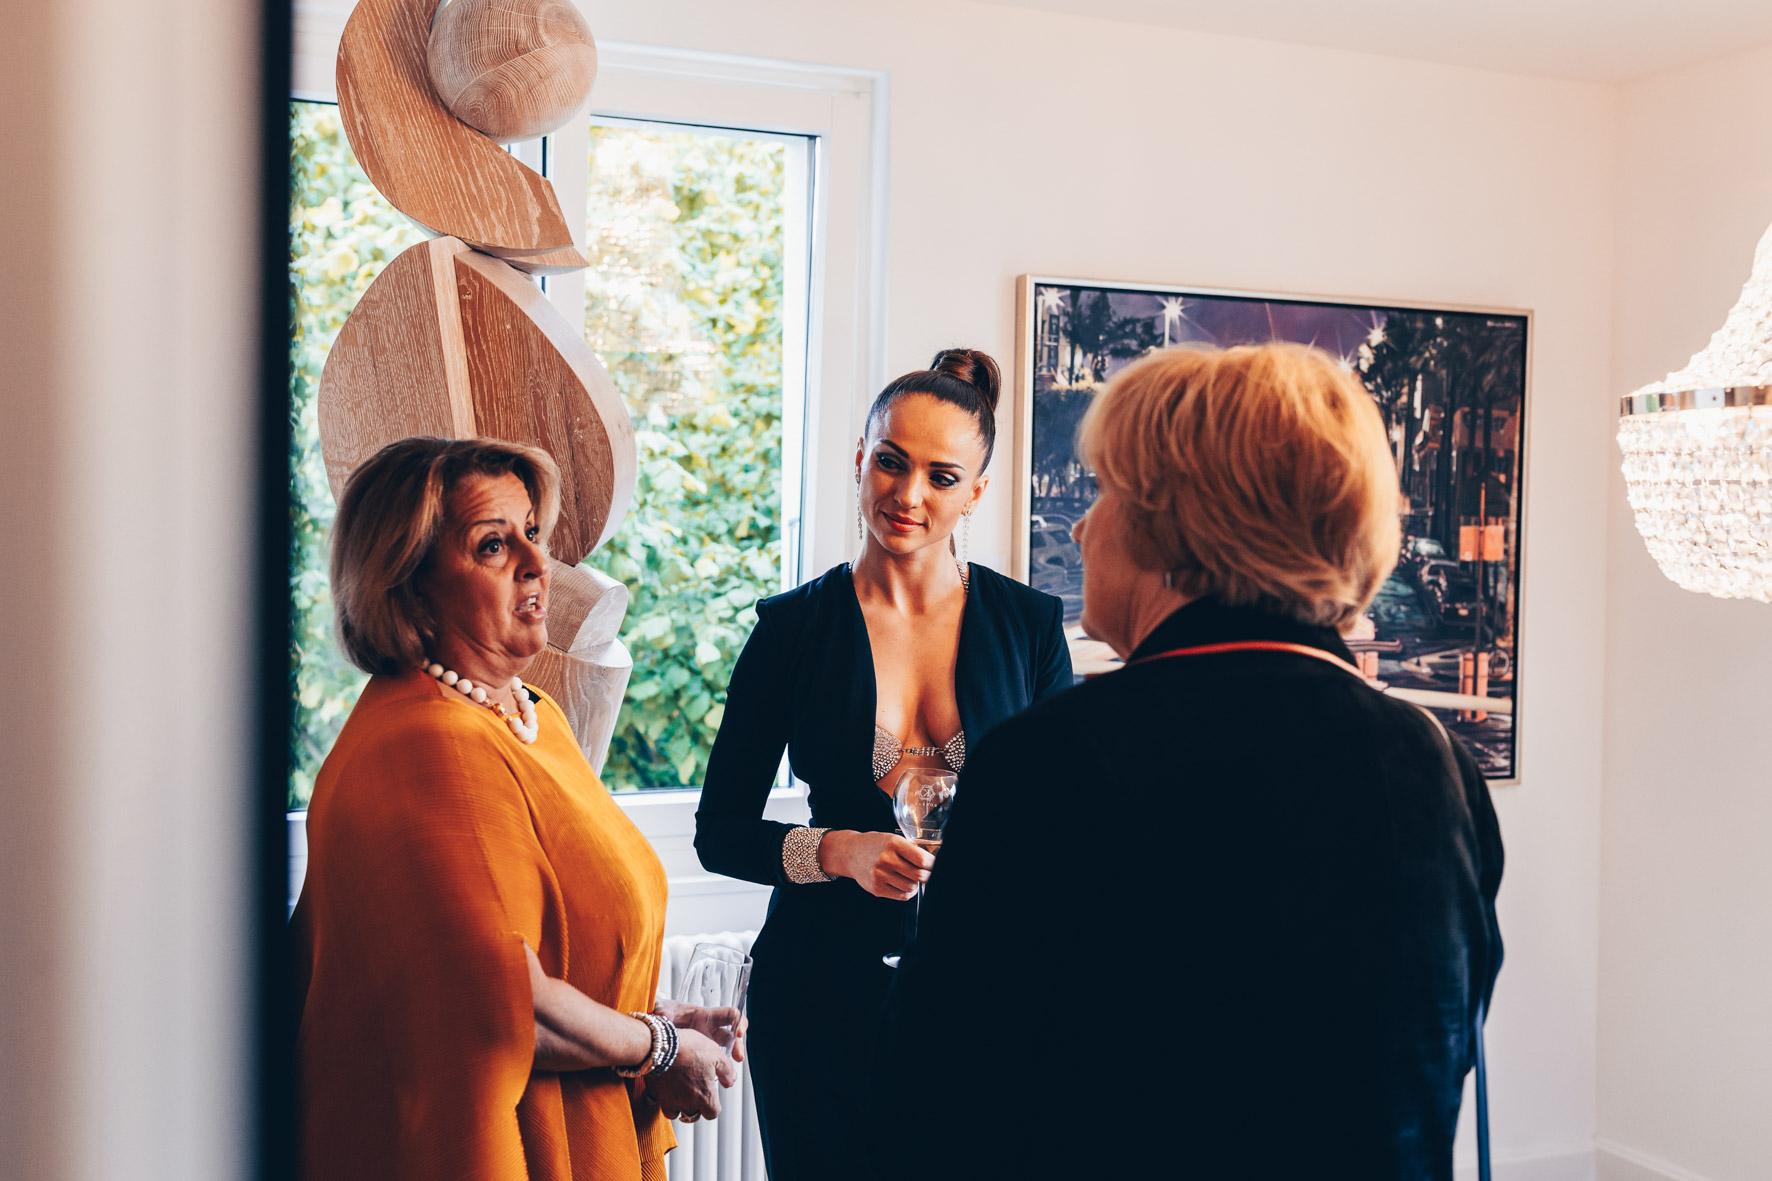 Konrad-lifestyle-art-basel-%22c.f.bucherer%22-2019-59.jpg